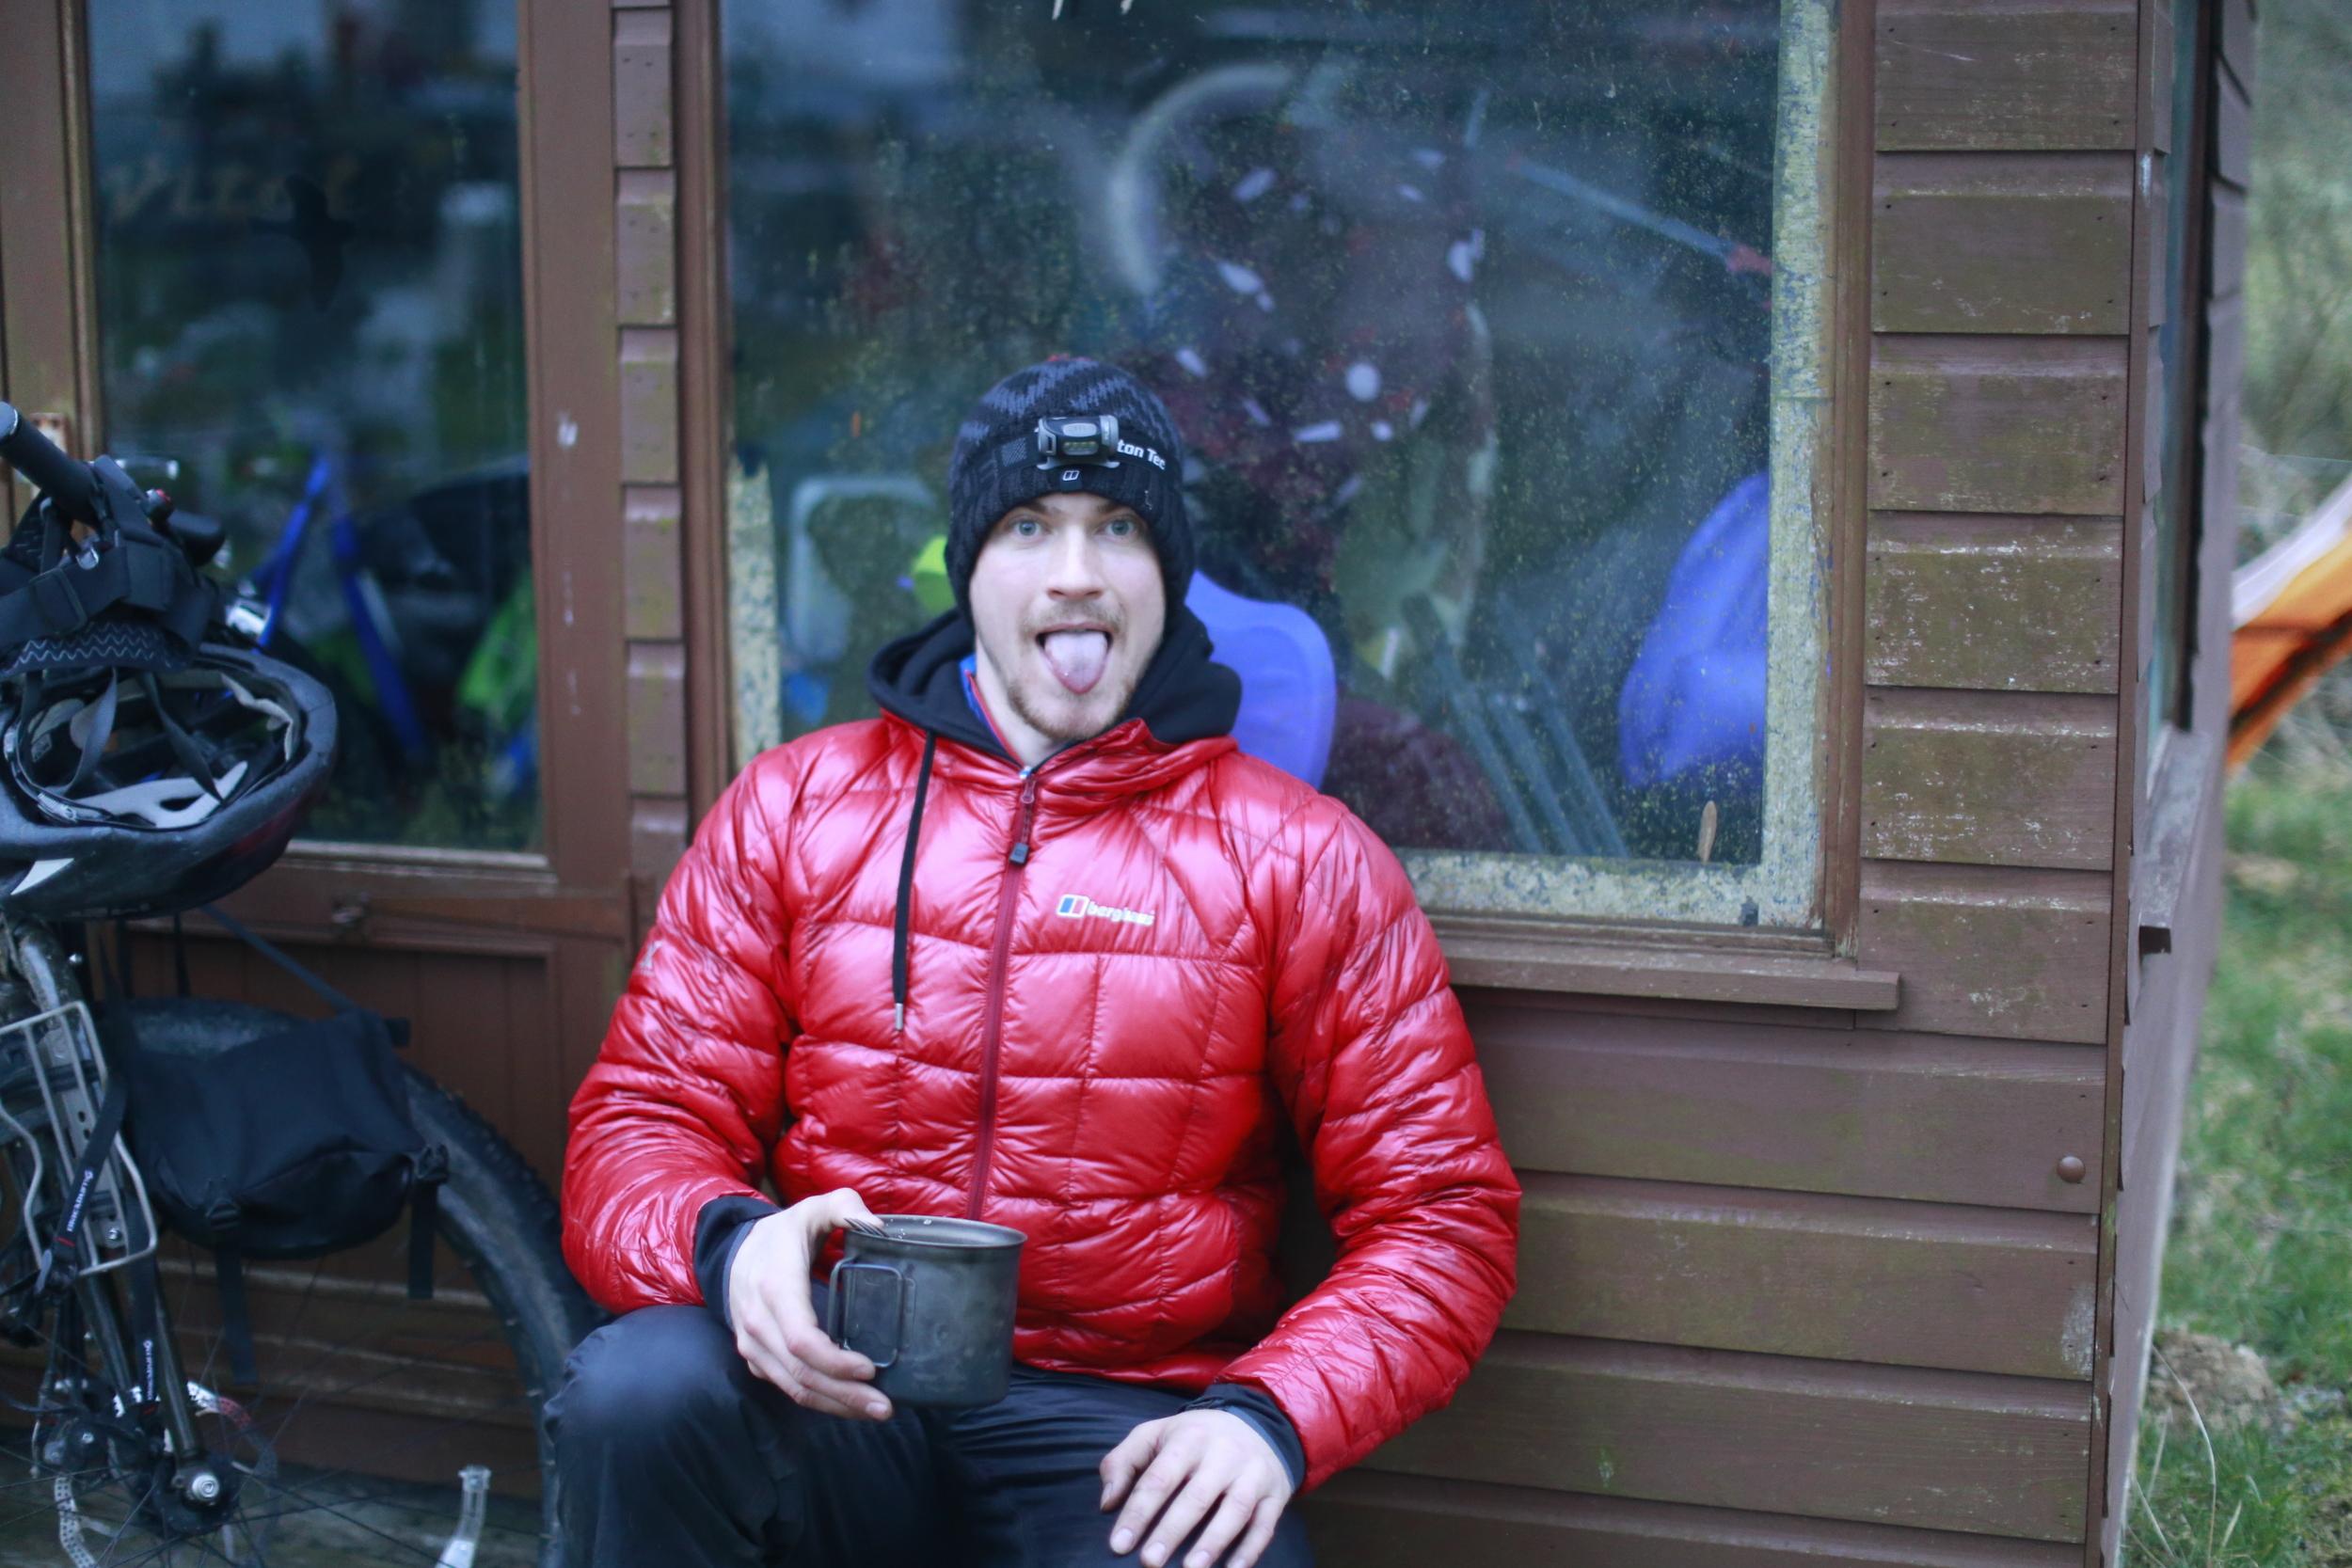 "breakfast, bear bones bivvy gear, food, porridge, rude health, rude health porridge, jack macgowan, the man behind bicycle touring apocalypse, travel, blog, bicycle touring apocalypse, bicycle touring, cycle touring, wales, cycling blog, photography blog, explore, adventure, adventure cycling, cycle, ride, discover, discovery, surly, surly ecr, wildcat, wildcat gear, revelate designs, trangia, klean kanteen, knards, fat bike, 3"" tyres, surly rear rack, snugpak, blackburn designs"